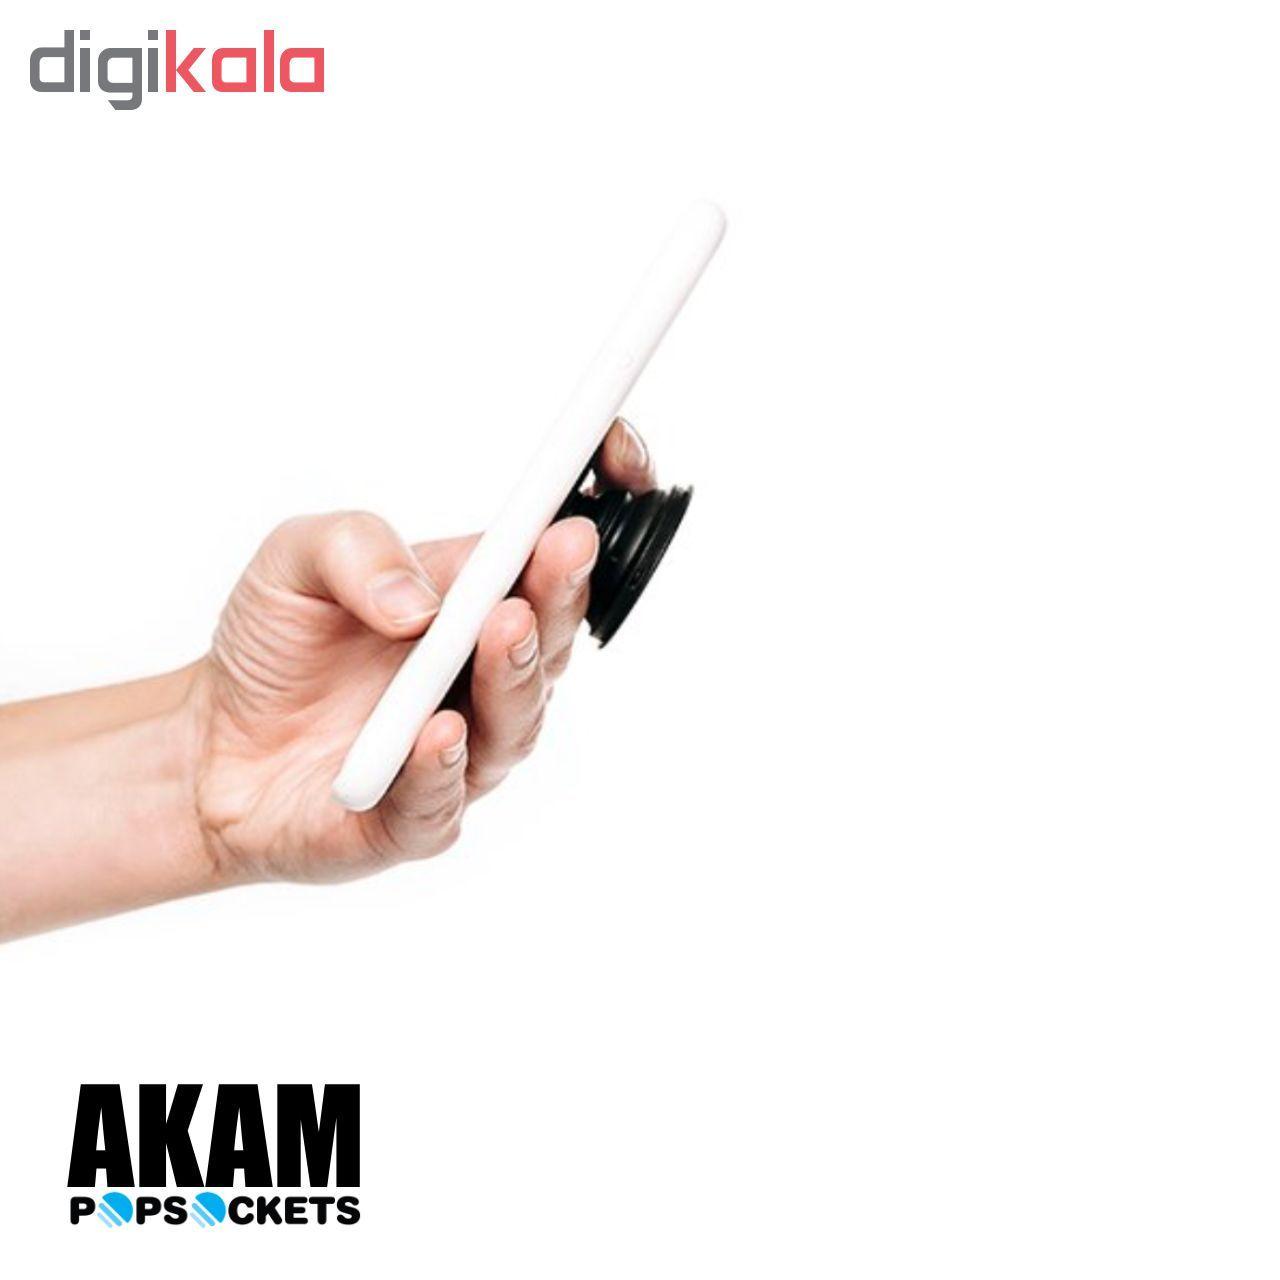 پایه نگهدارنده گوشی موبایل پاپ سوکت آکام مدل APS0056 main 1 9